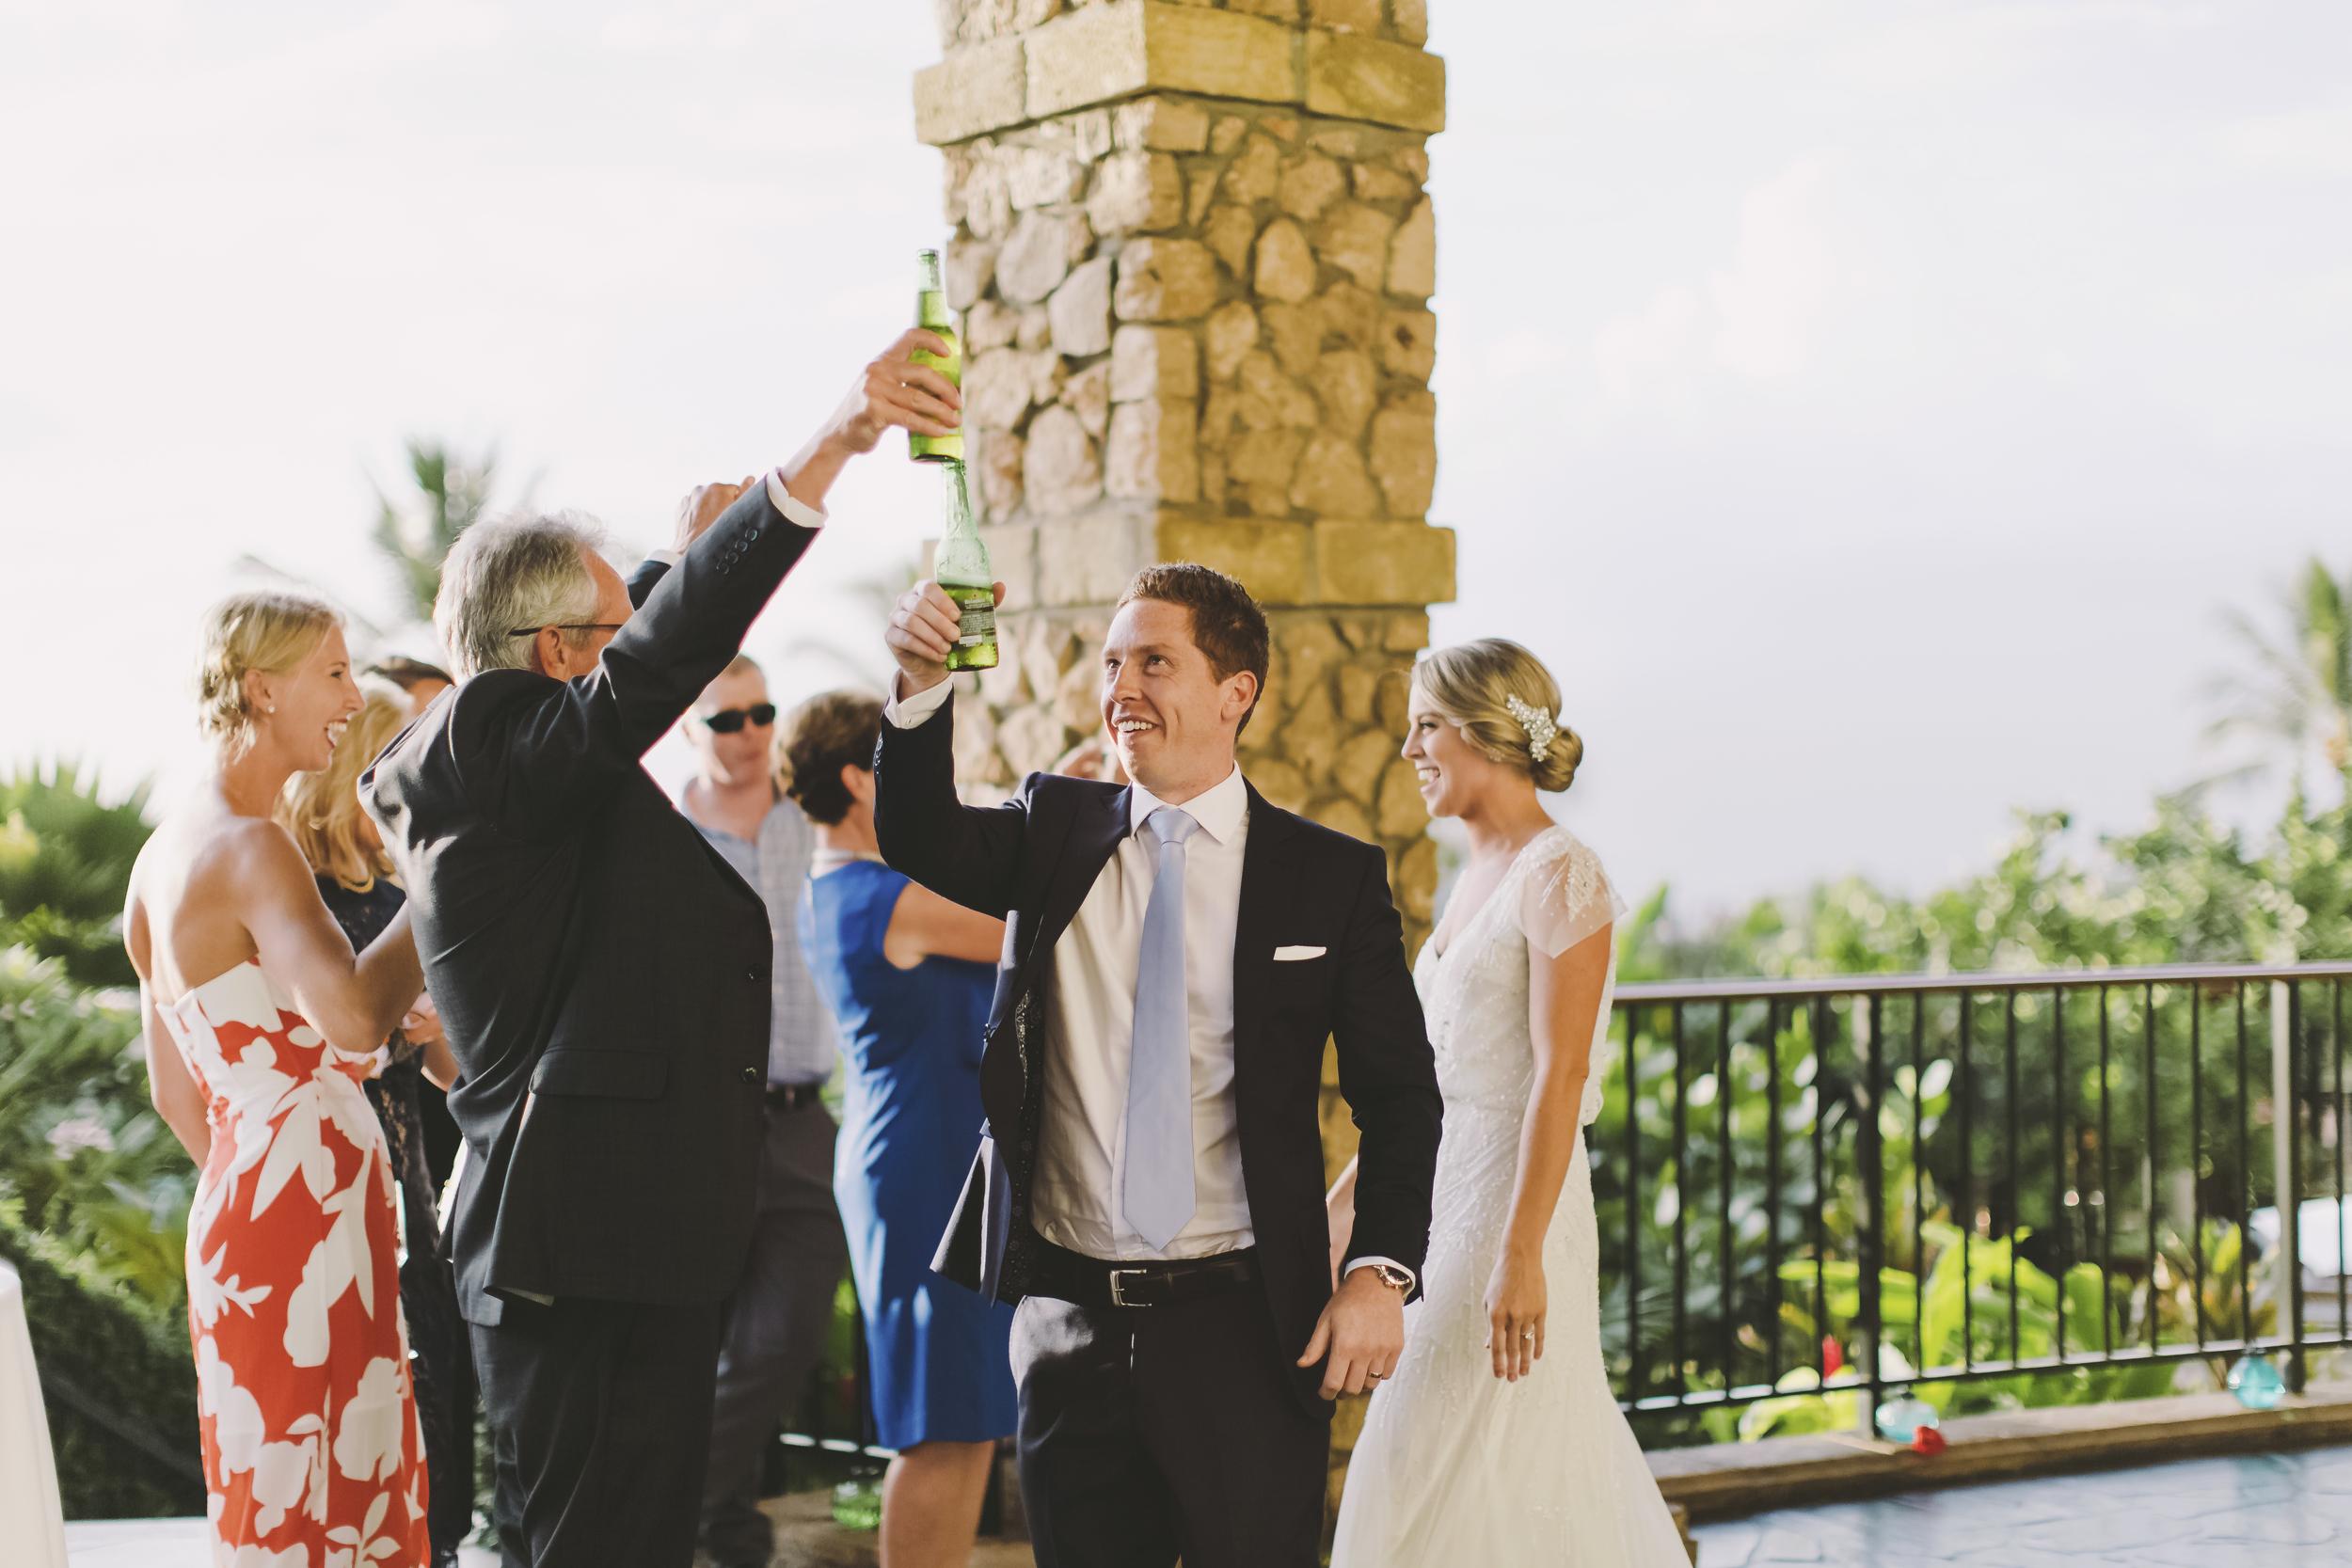 angie-diaz-photography-maui-wedding-mel-matt-91.jpg